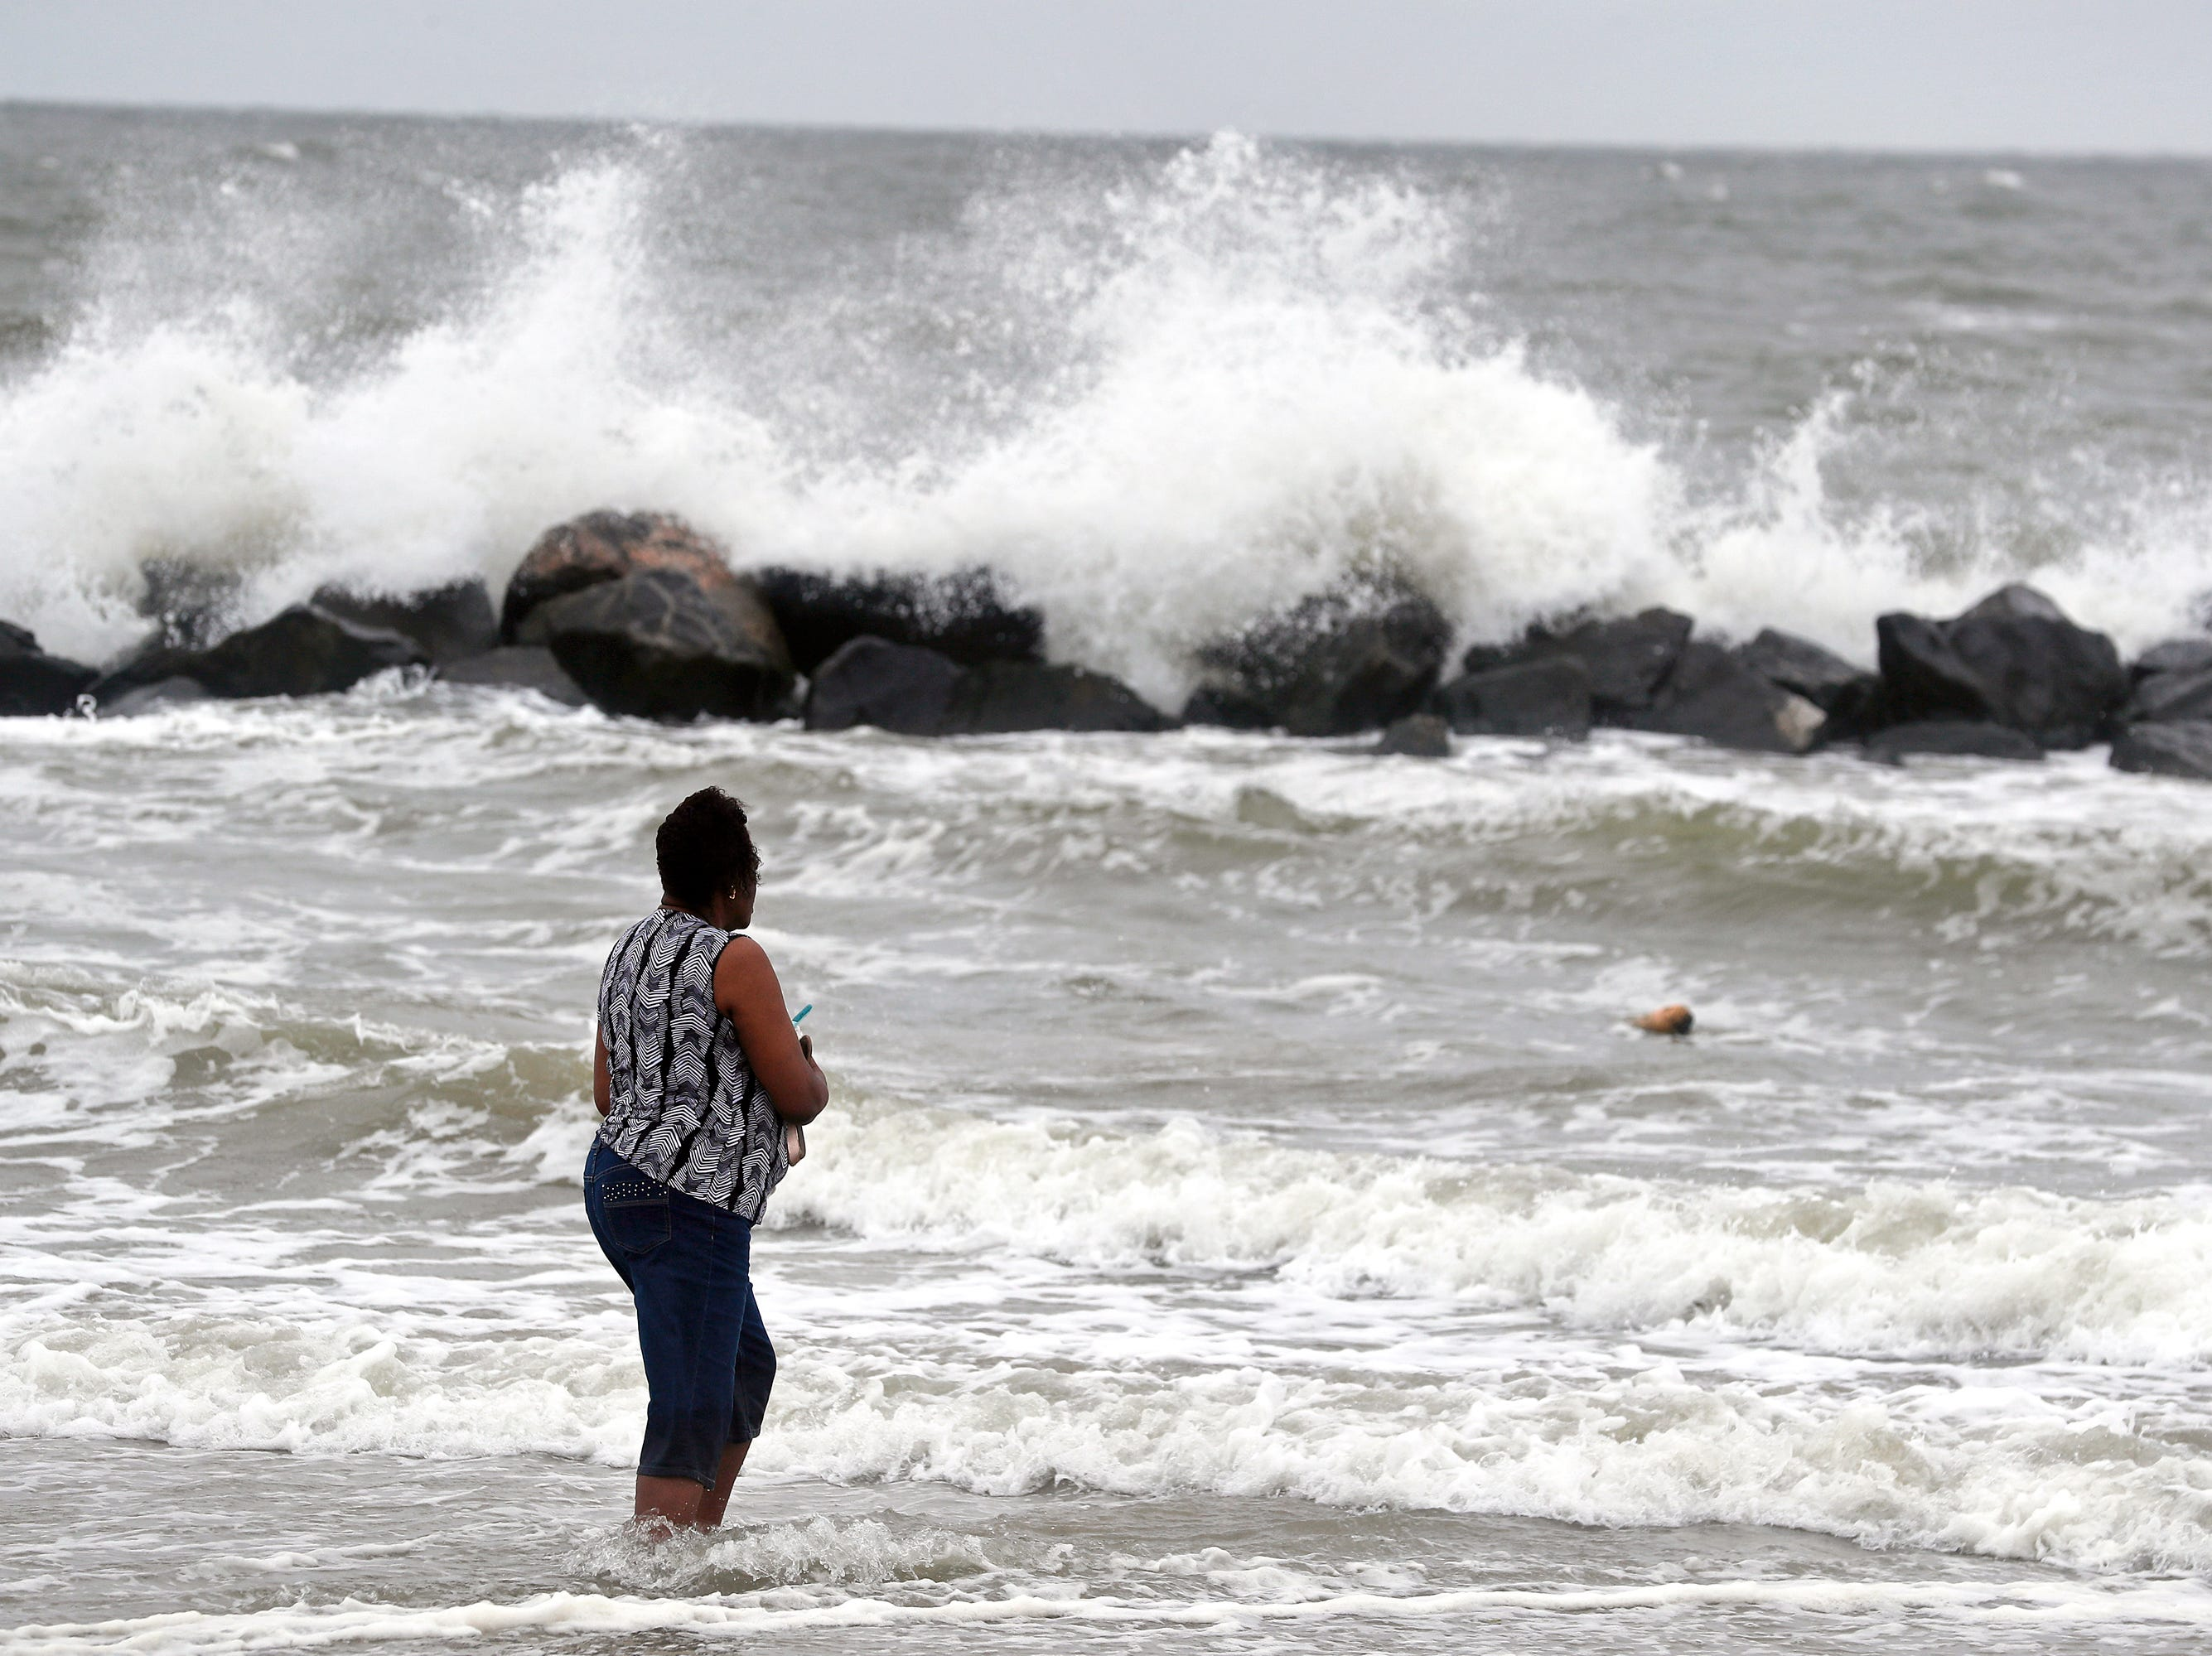 Gwen Patterson watches as waves crash ashore at Buckroe Beach in Hampton, Va., Thursday, Sept. 13, 2018 as Hurricane Florence approaches the coast.  (Jonathon Gruenke/The Daily Press via AP)